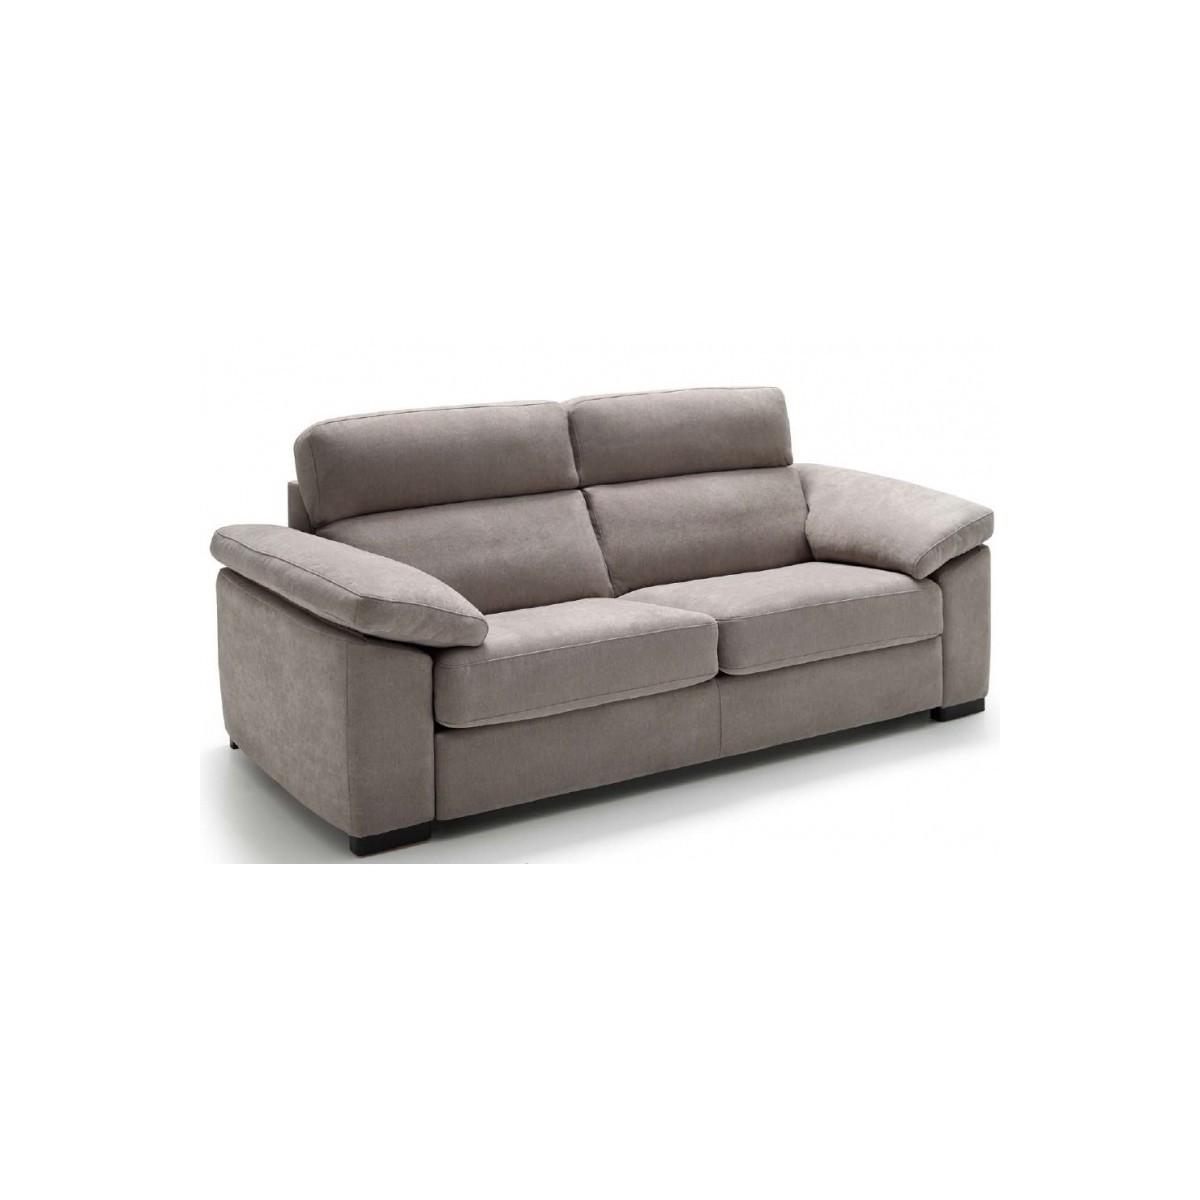 sof cama premium sistema italiano mubeko